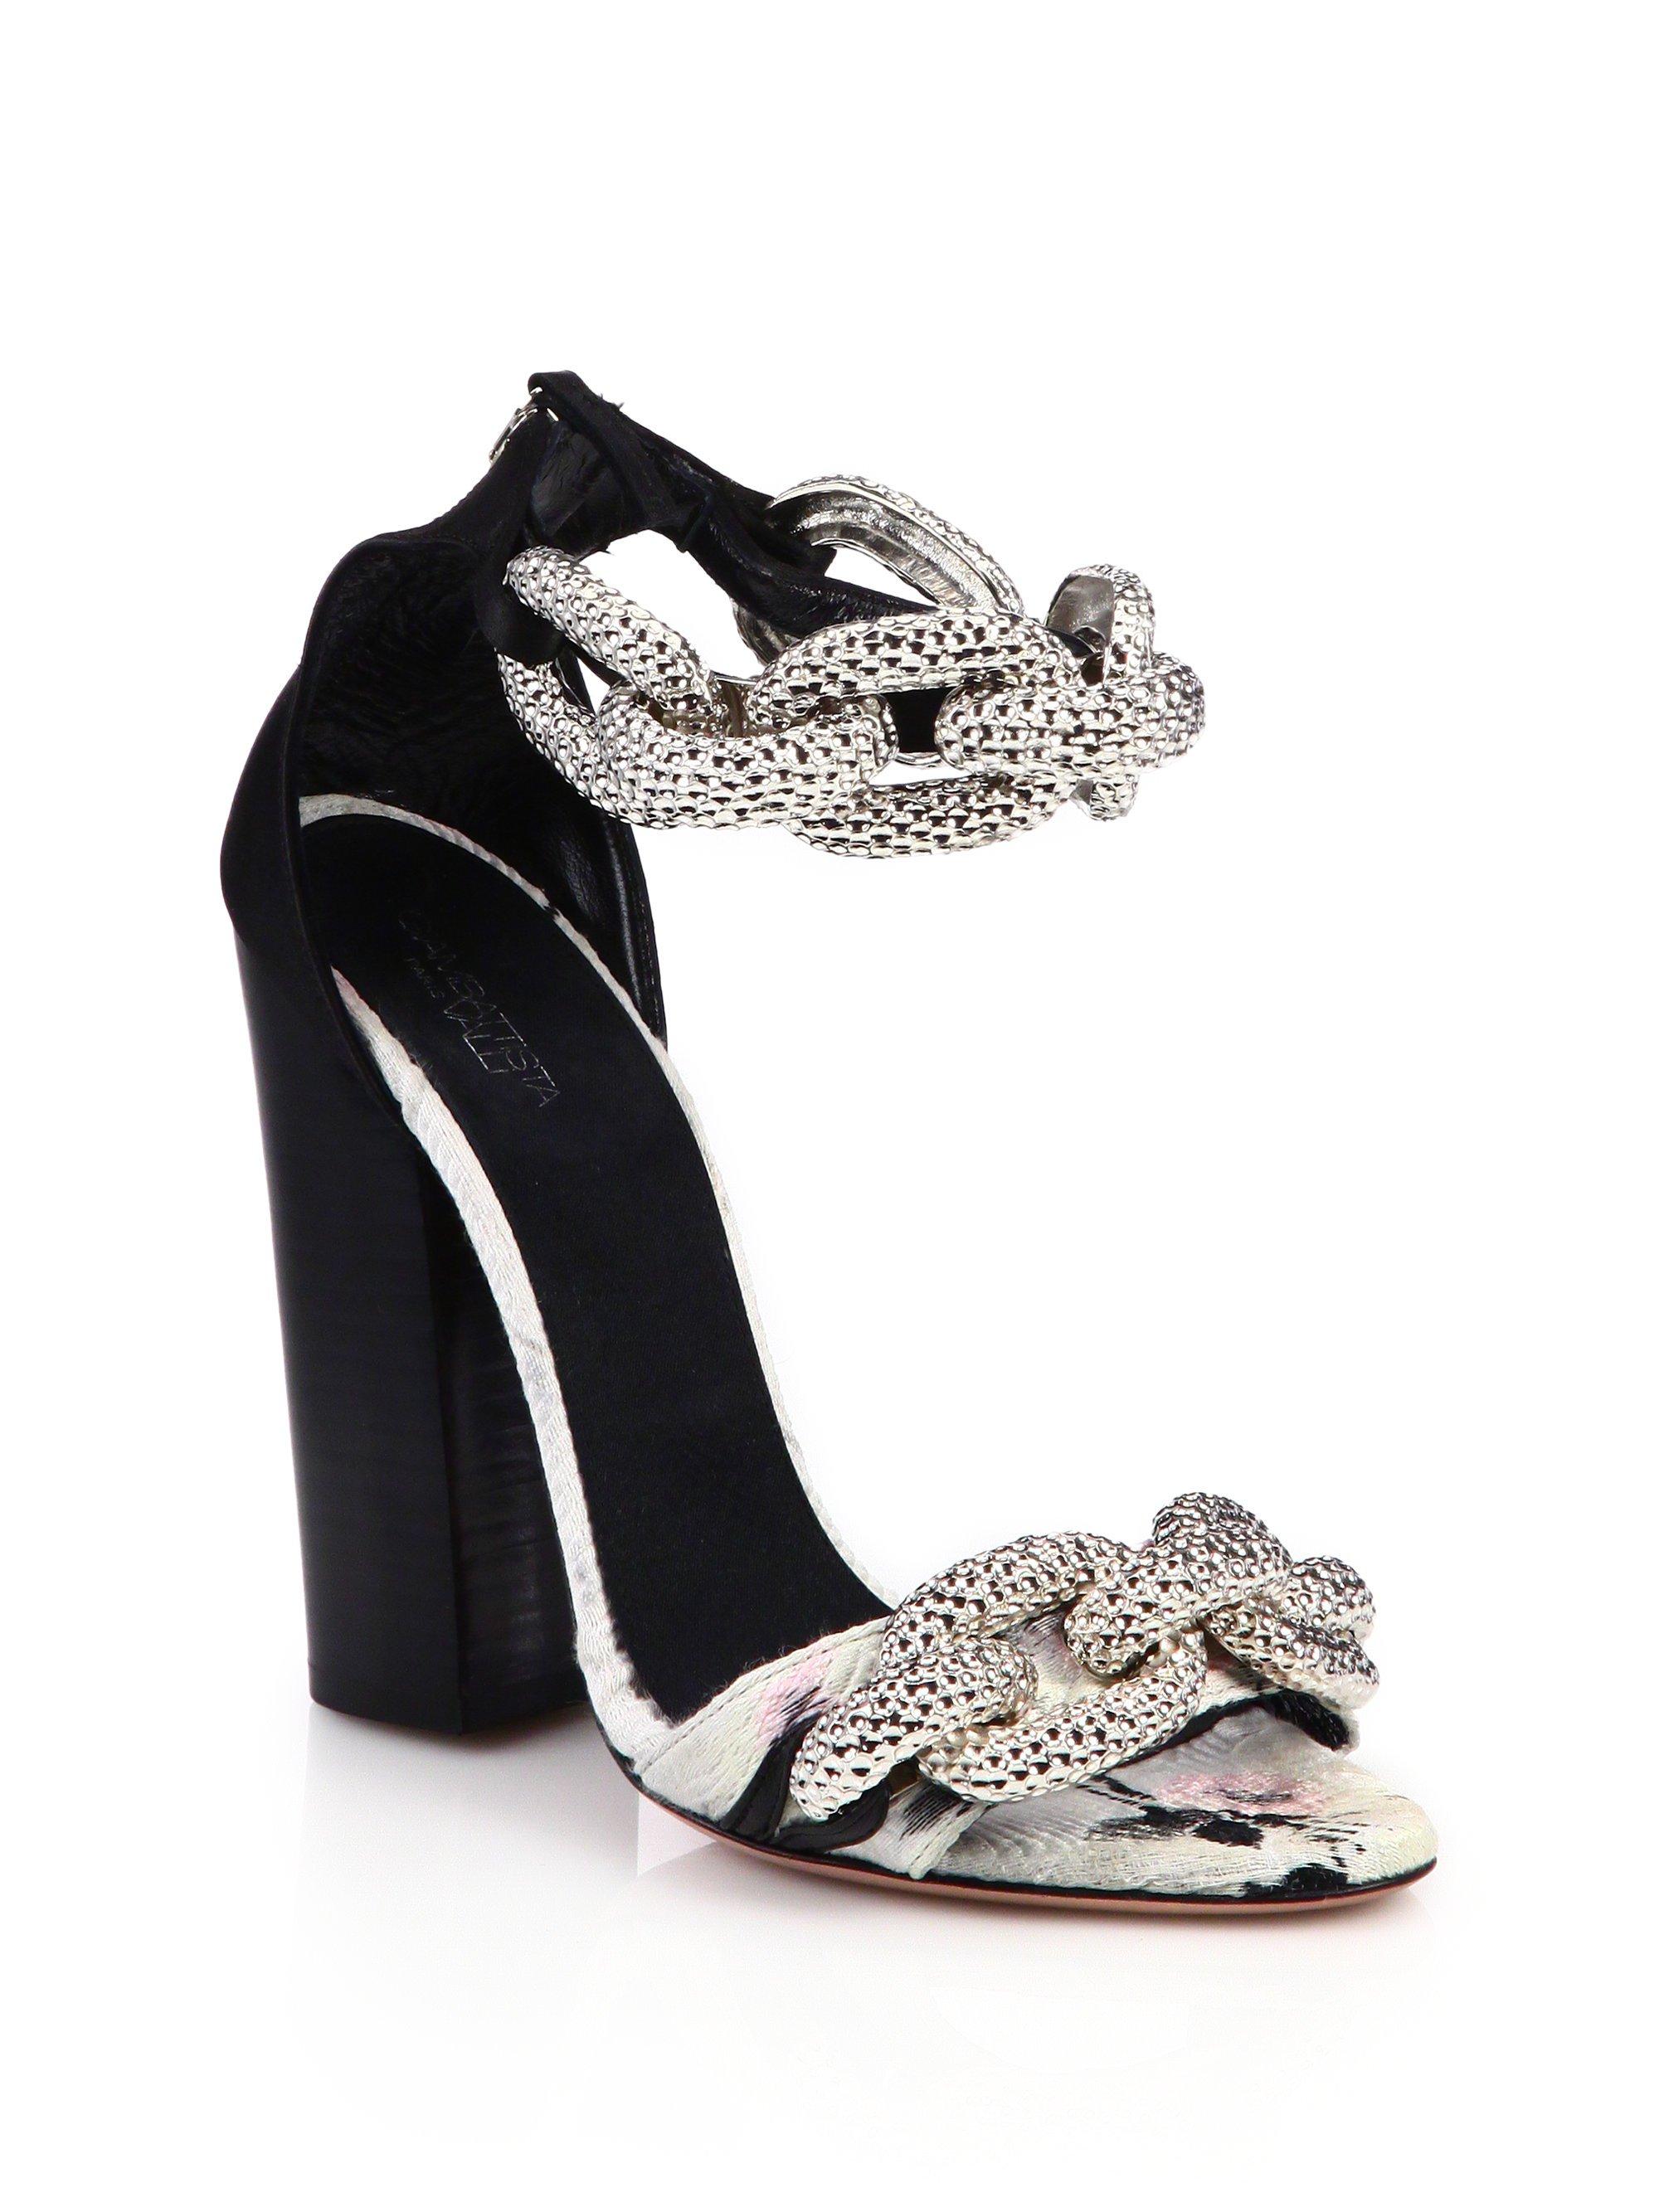 competitive price b7685 71c02 Giambattista Valli Metallic Chain, Fabric & Leather Sandals